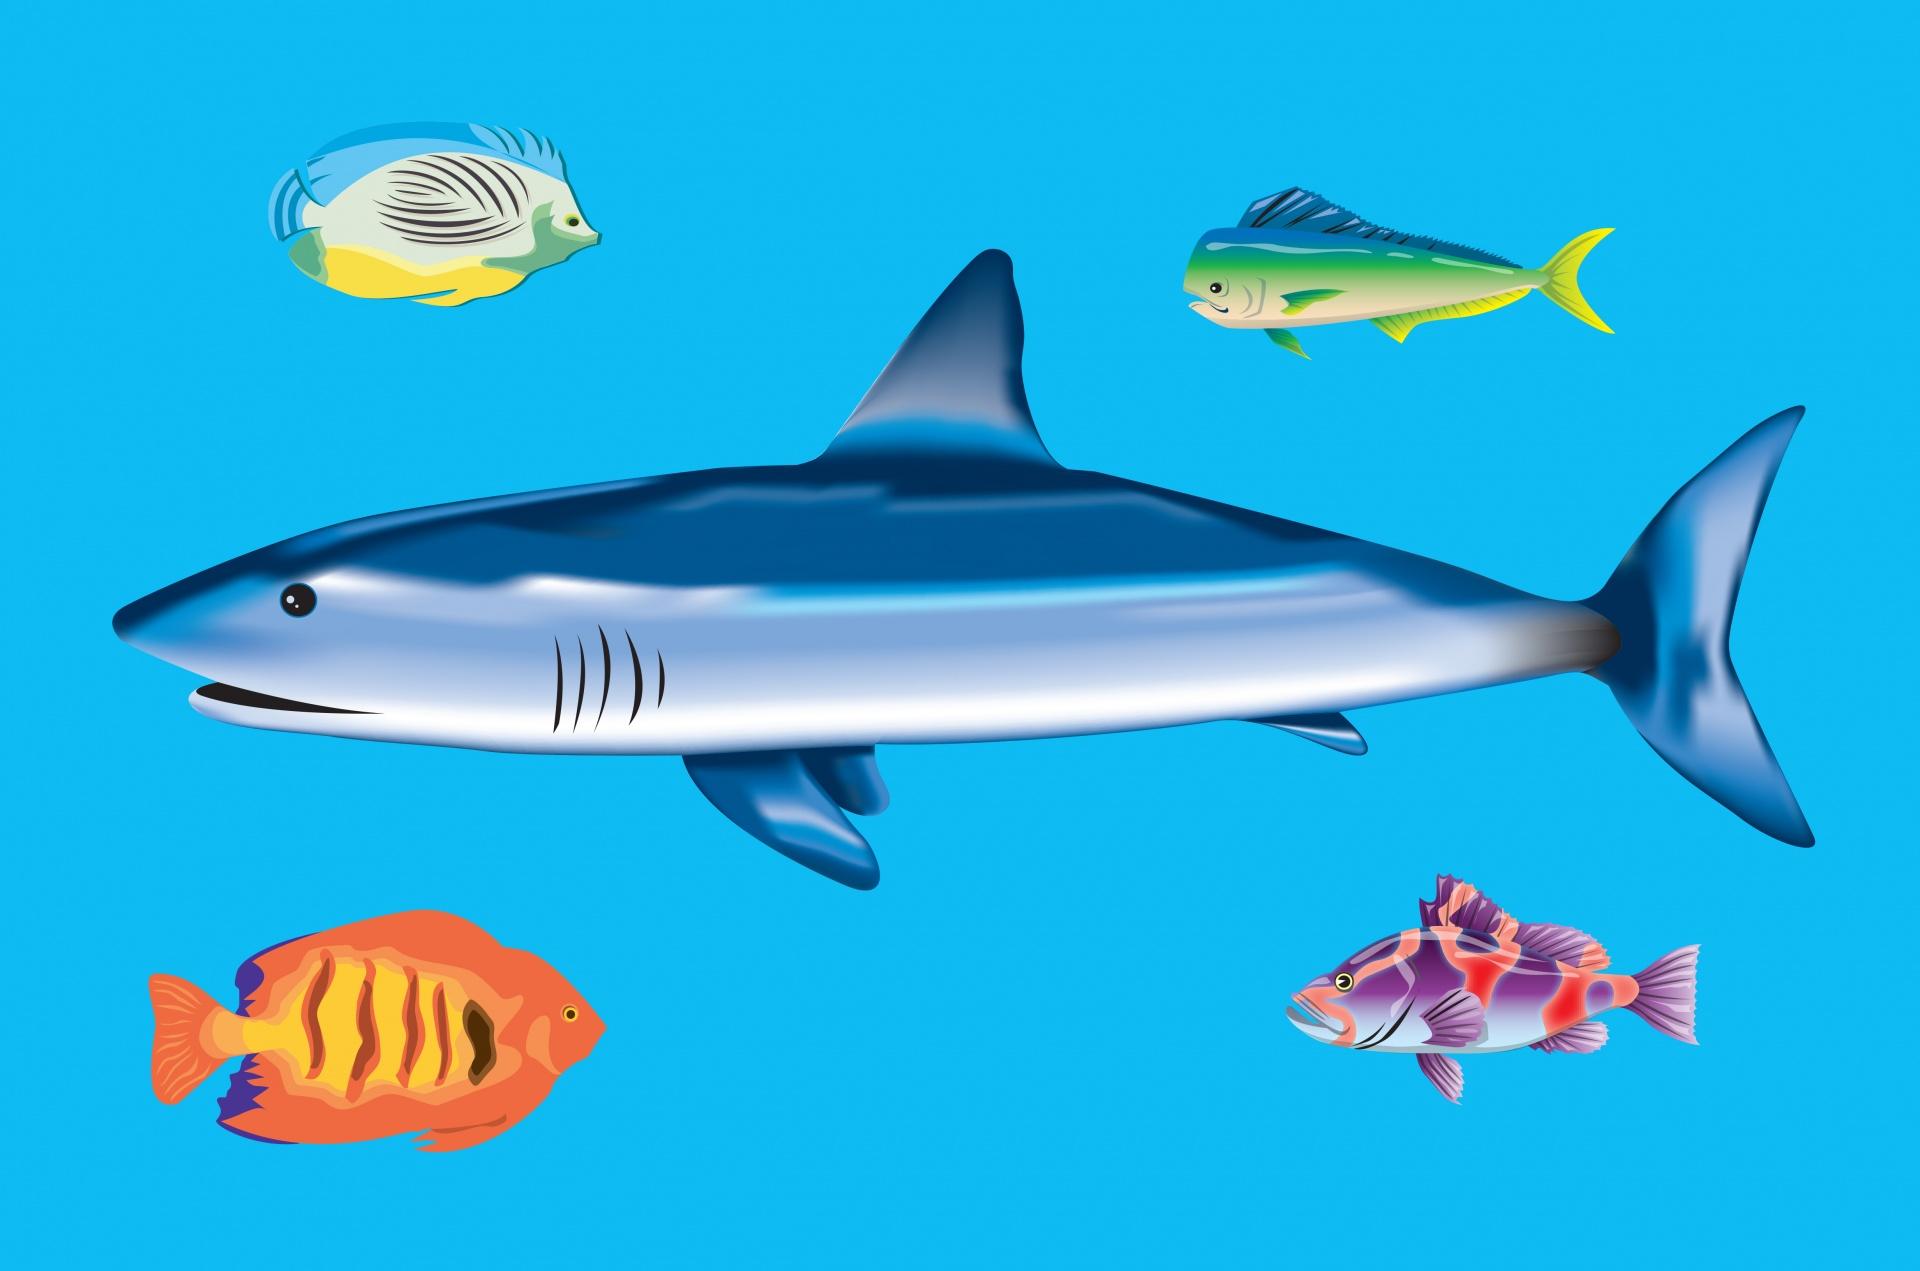 Ocean Animals Wallpaper Fish Free Stock Photo Public Domain Pictures